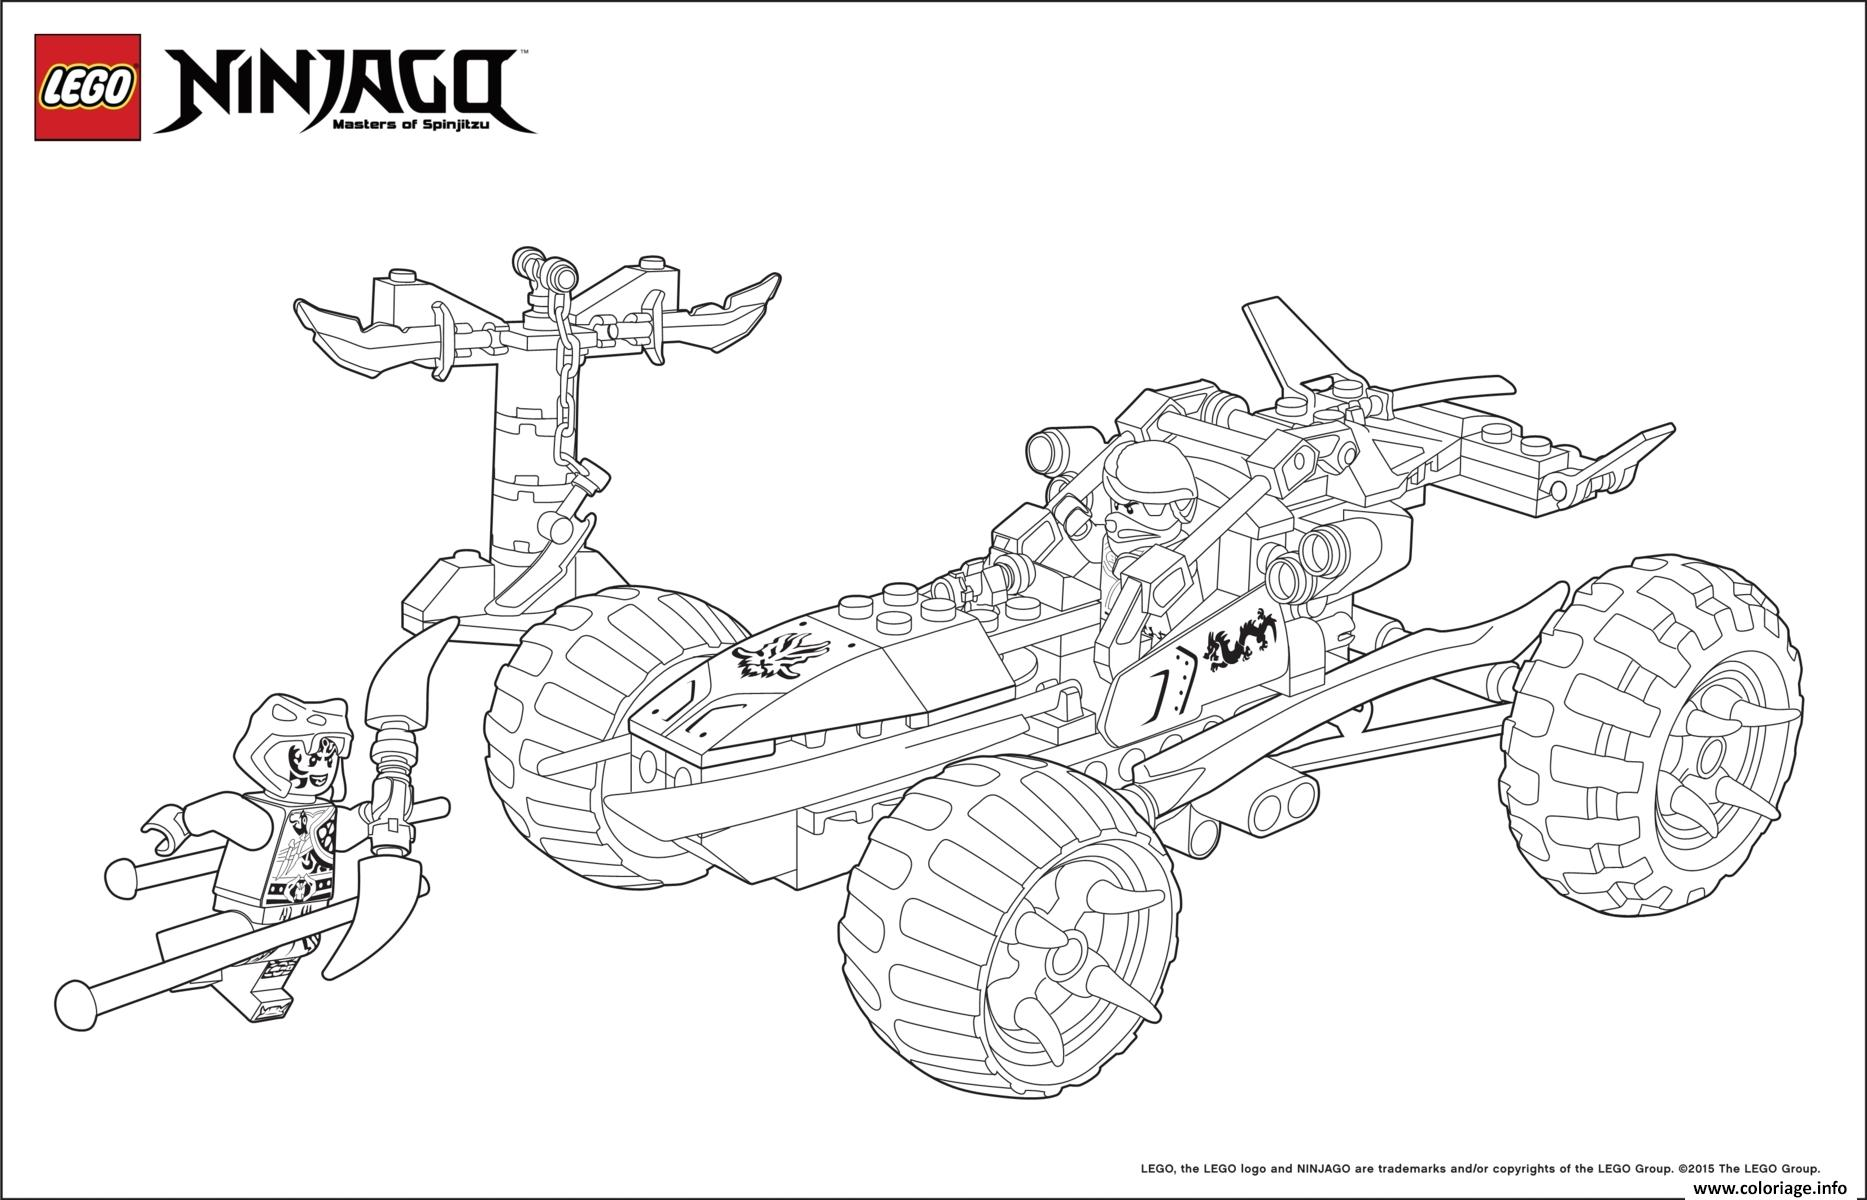 ninjago lego voiture 4x4 coloriage dessin